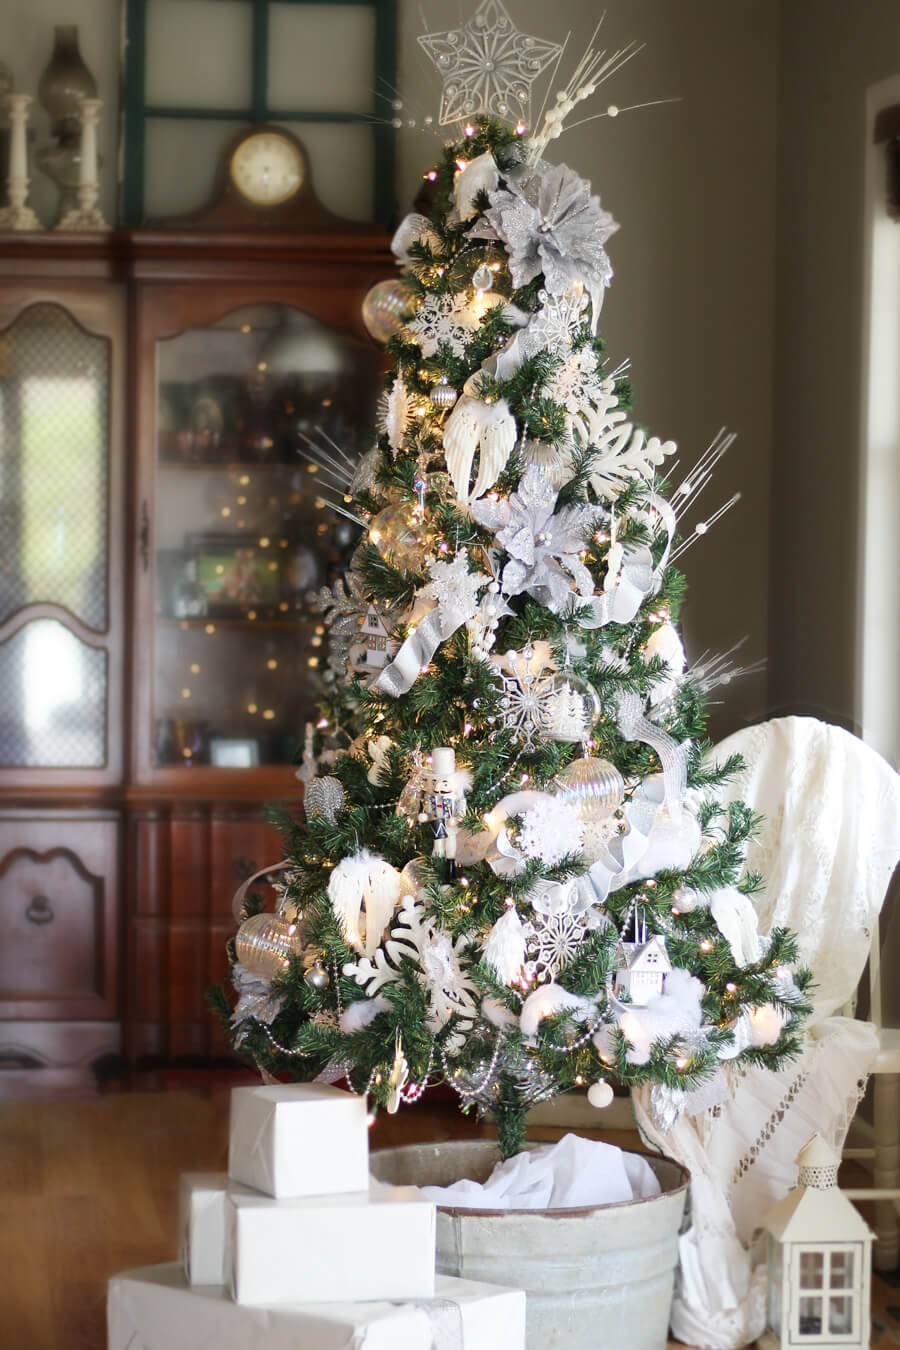 Winter White Christmas Tree Decorating Ideas | Buy This ...